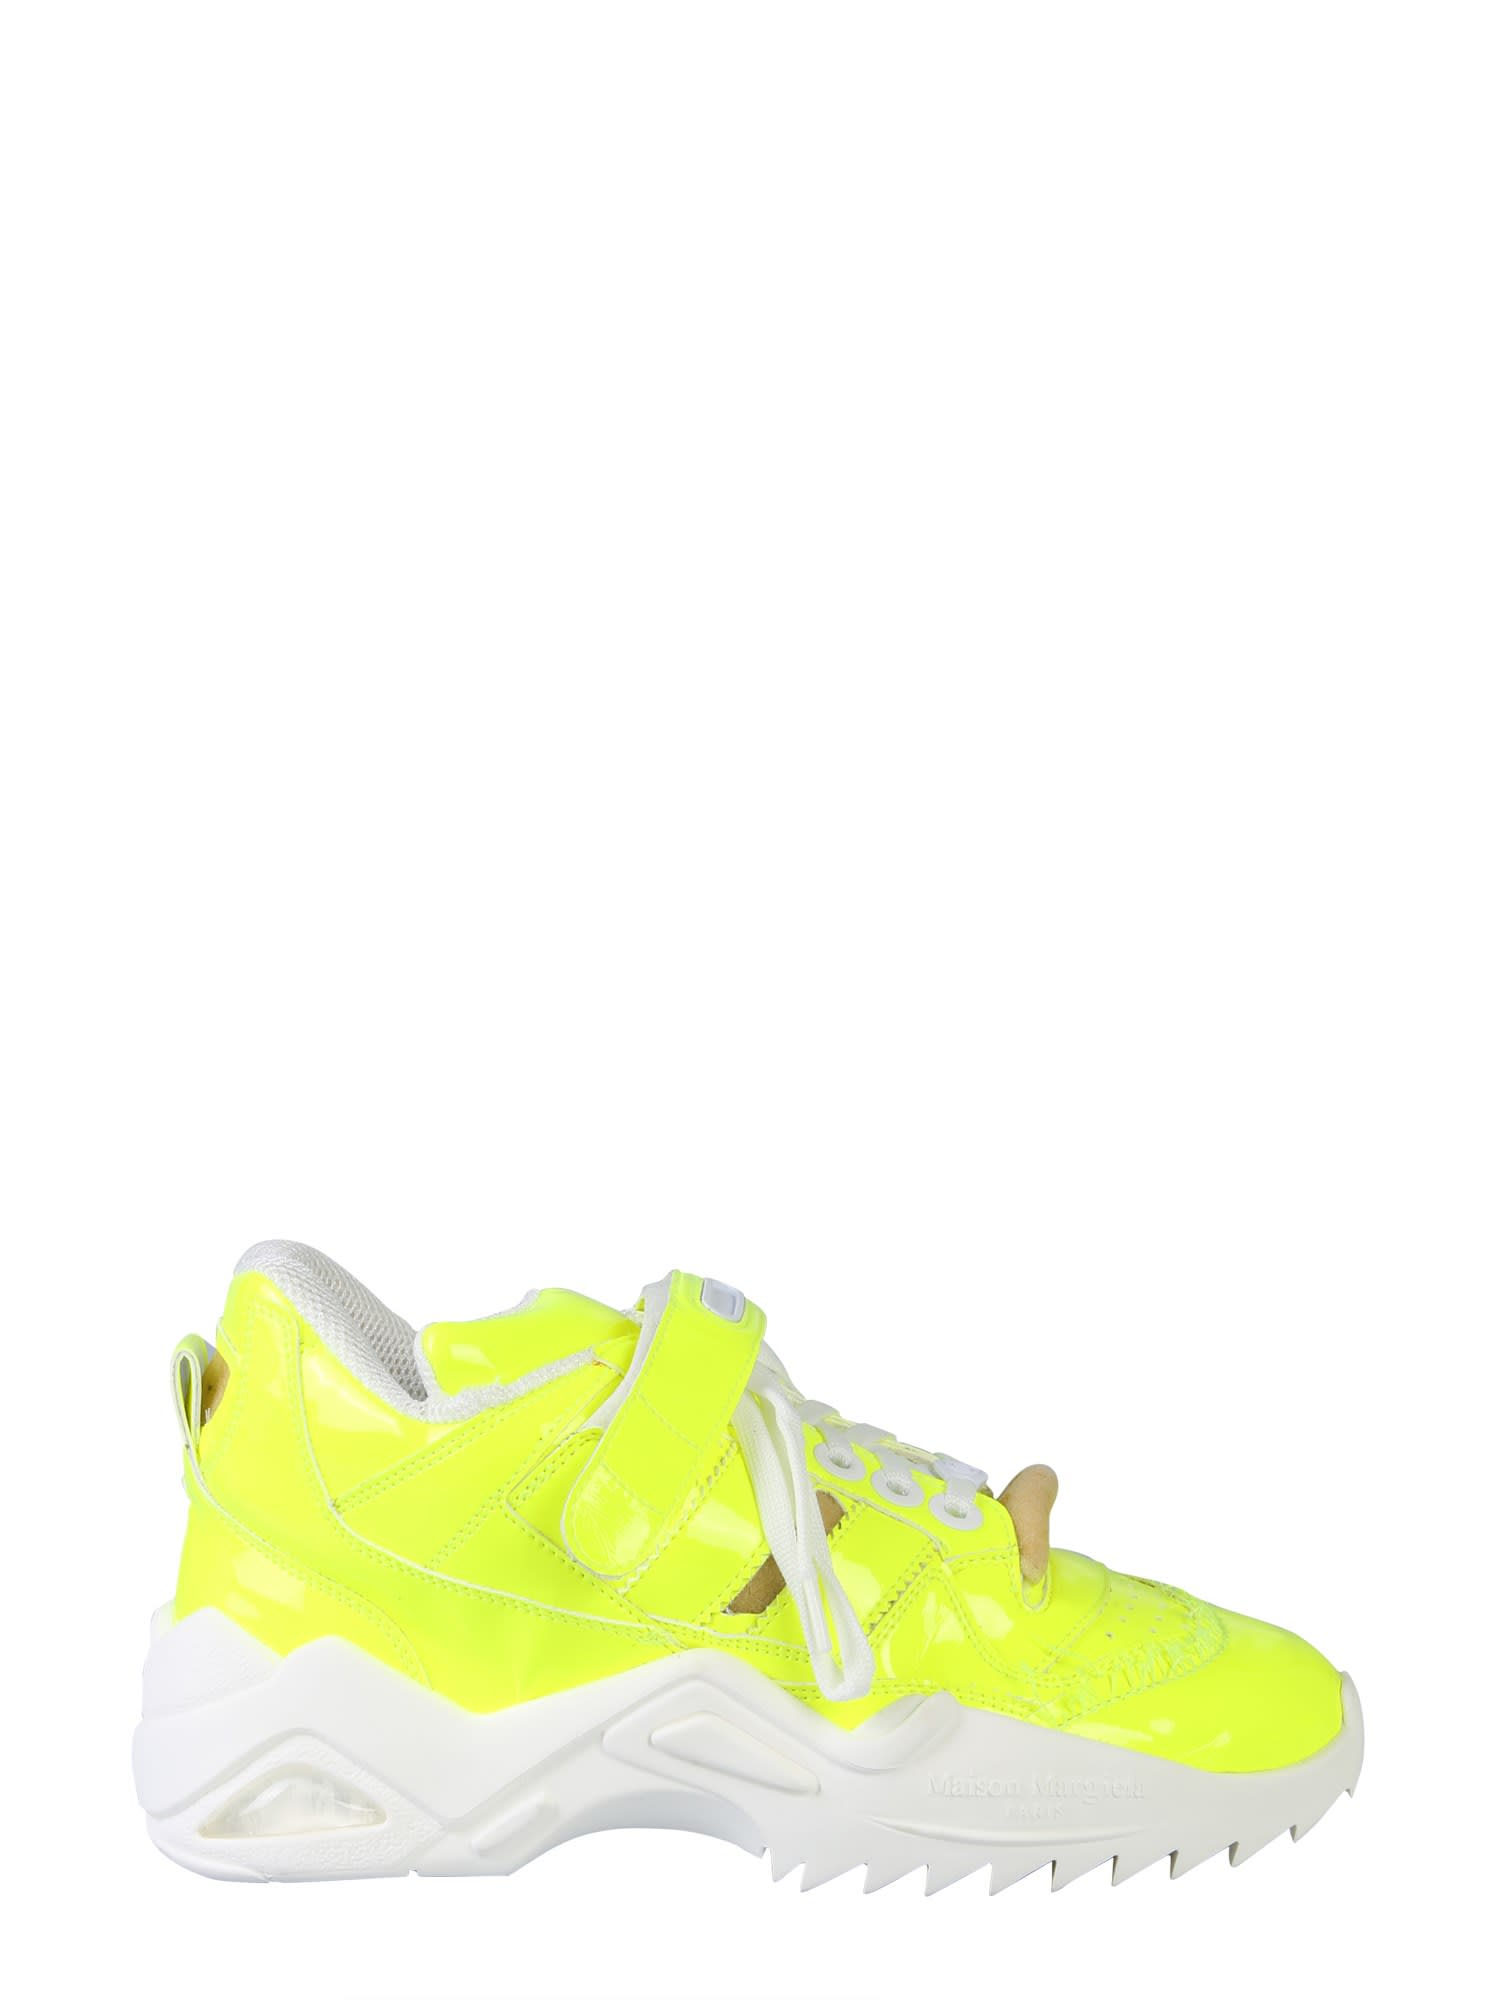 Buy Maison Margiela Low-top Sneaker online, shop Maison Margiela shoes with free shipping